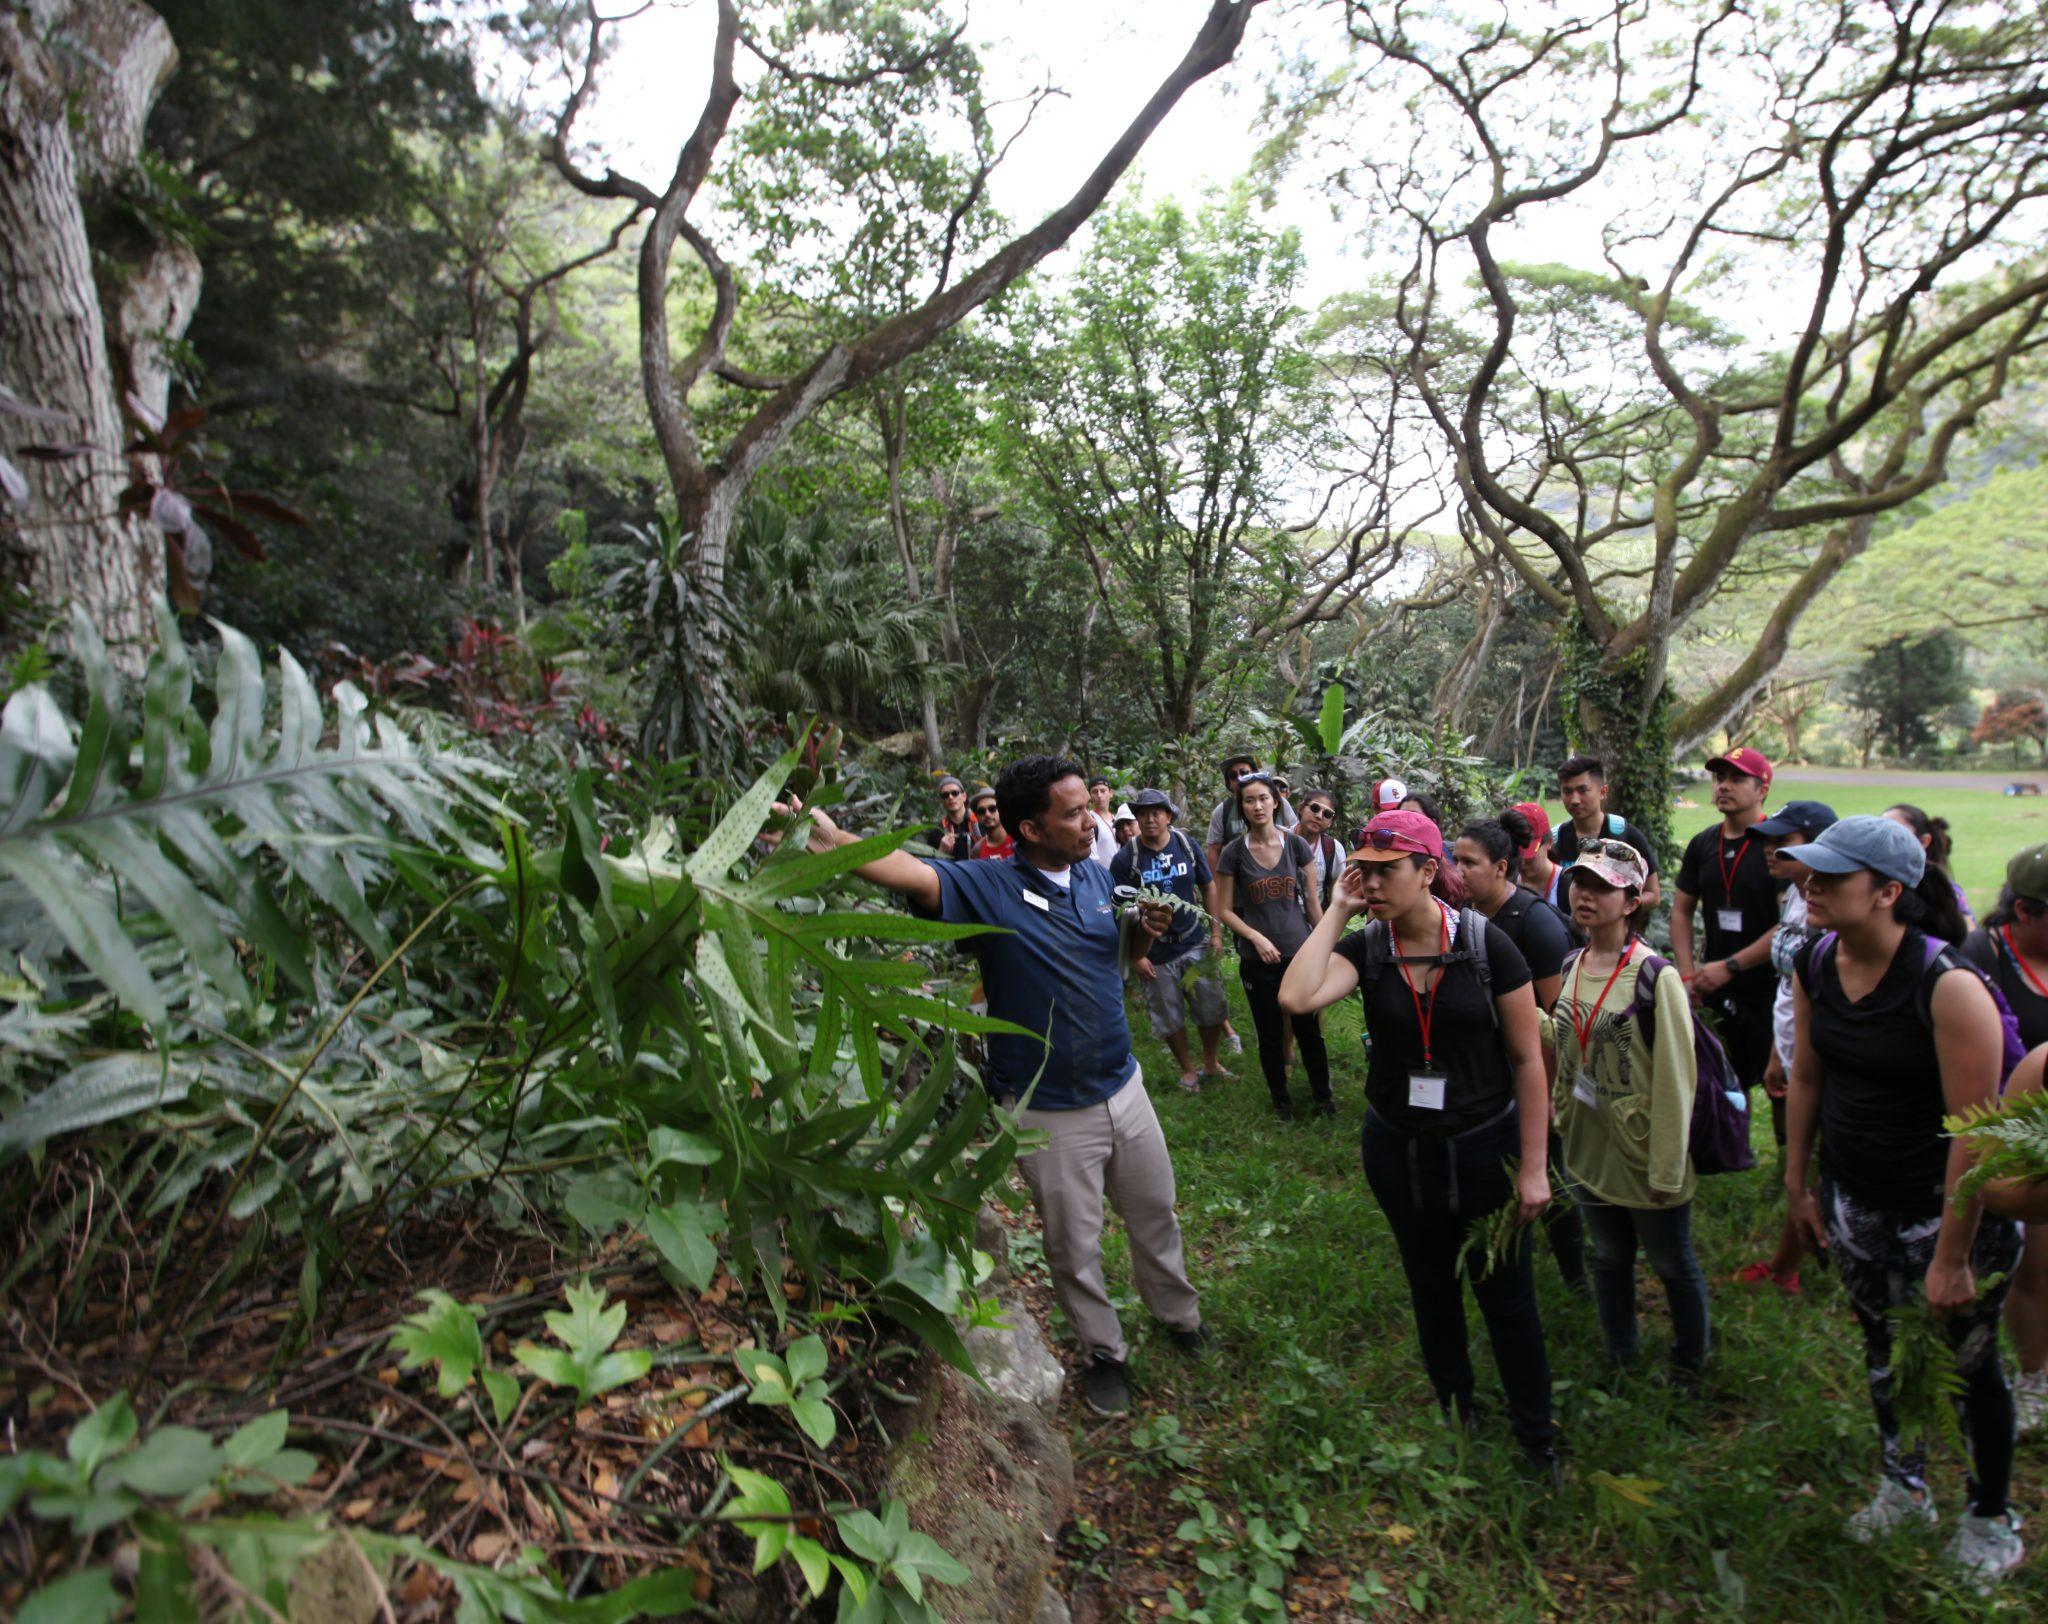 Rainforest Romp to see Beloved Rare birds